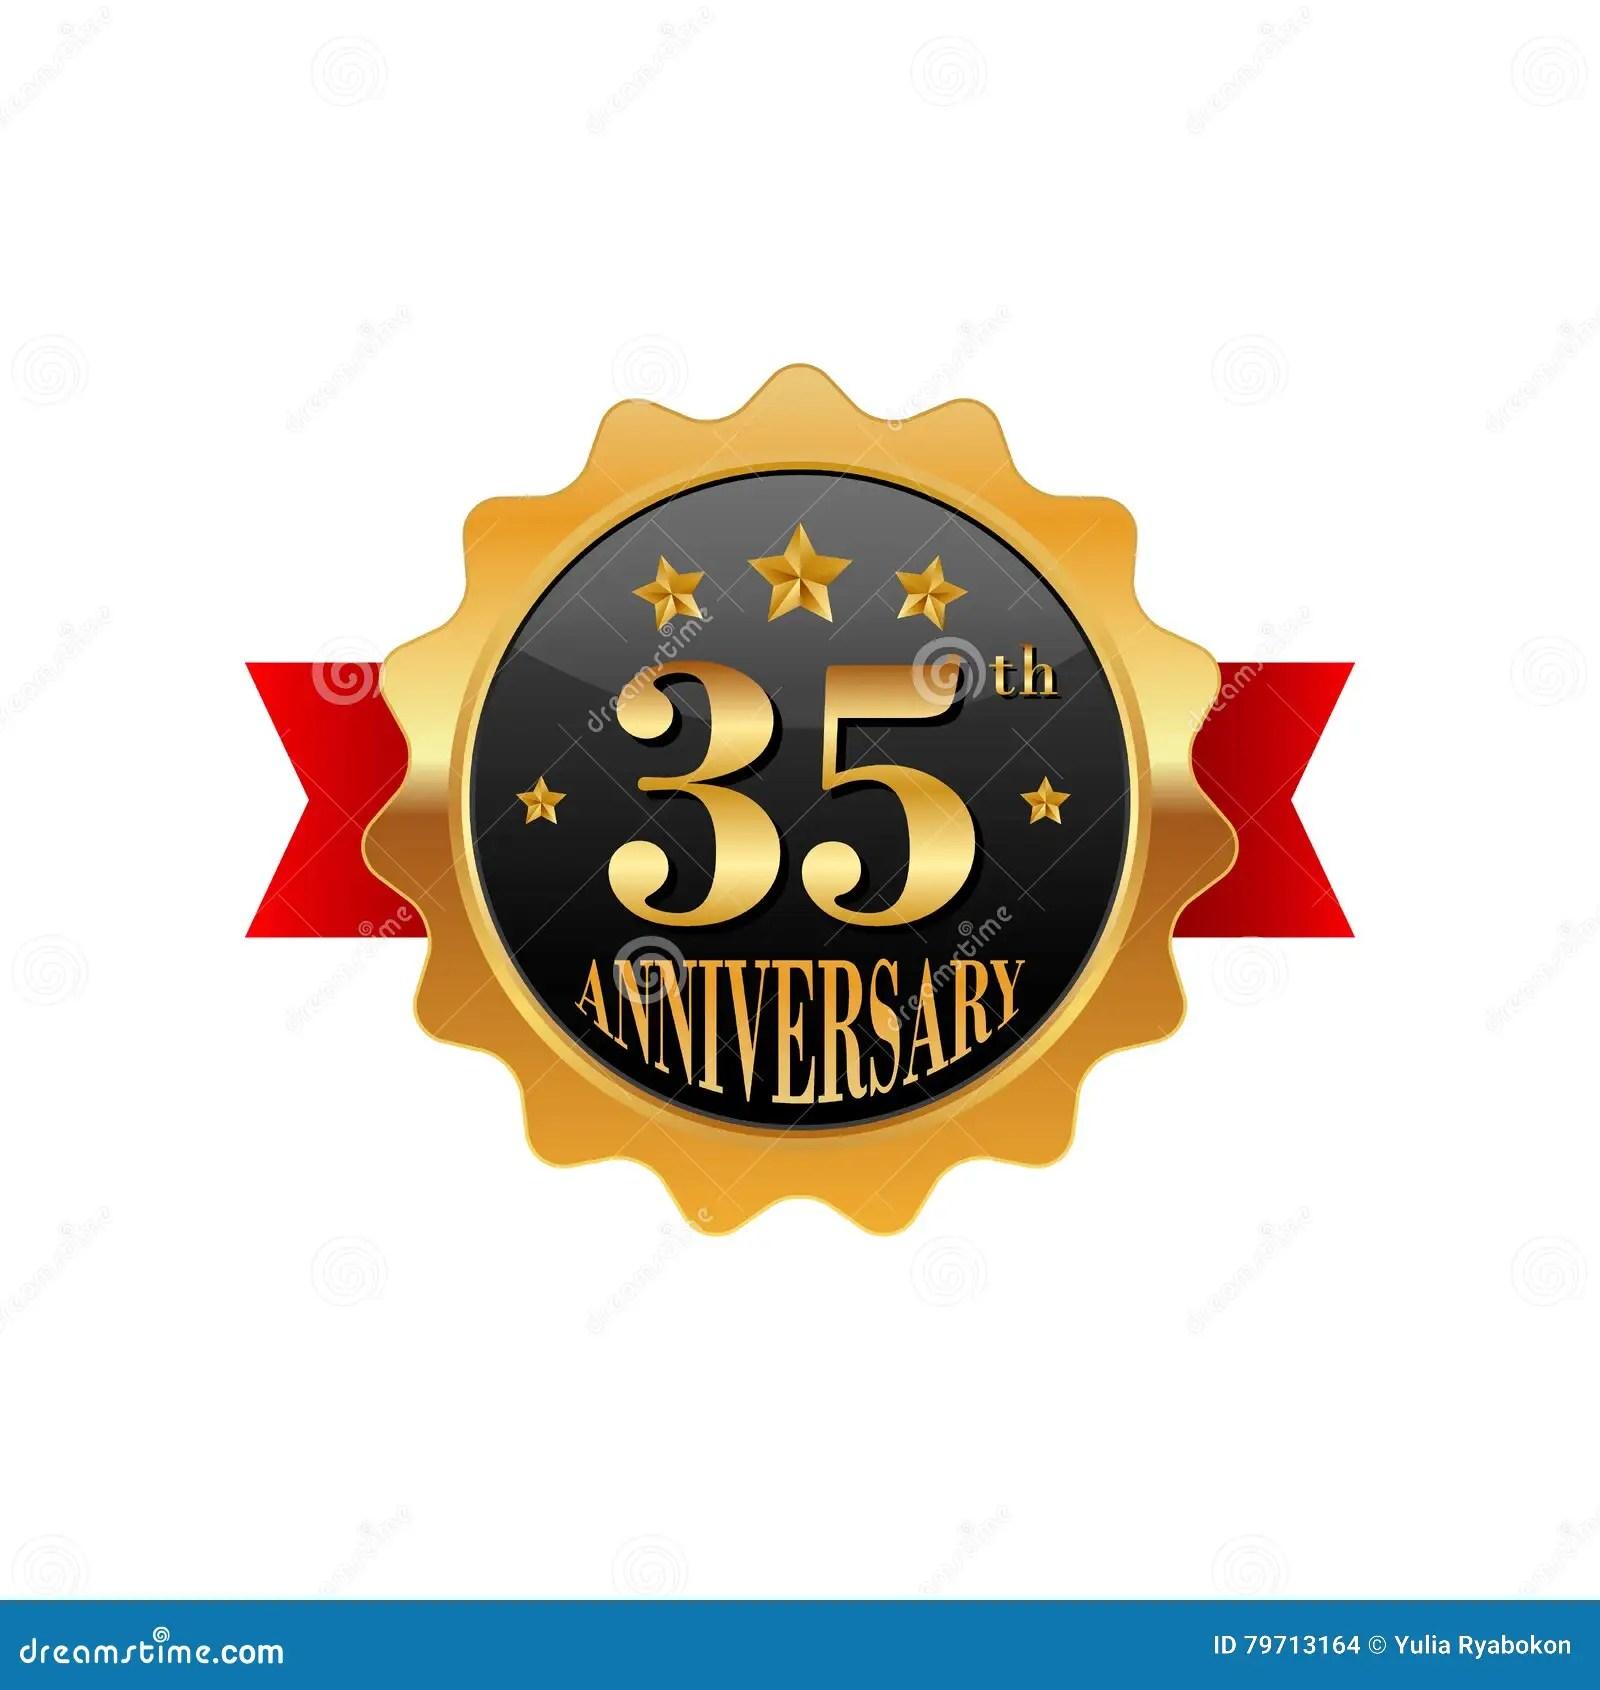 96 2 Year Anniversary Symbol 2 Year Anniversary Adda Coffee Tea